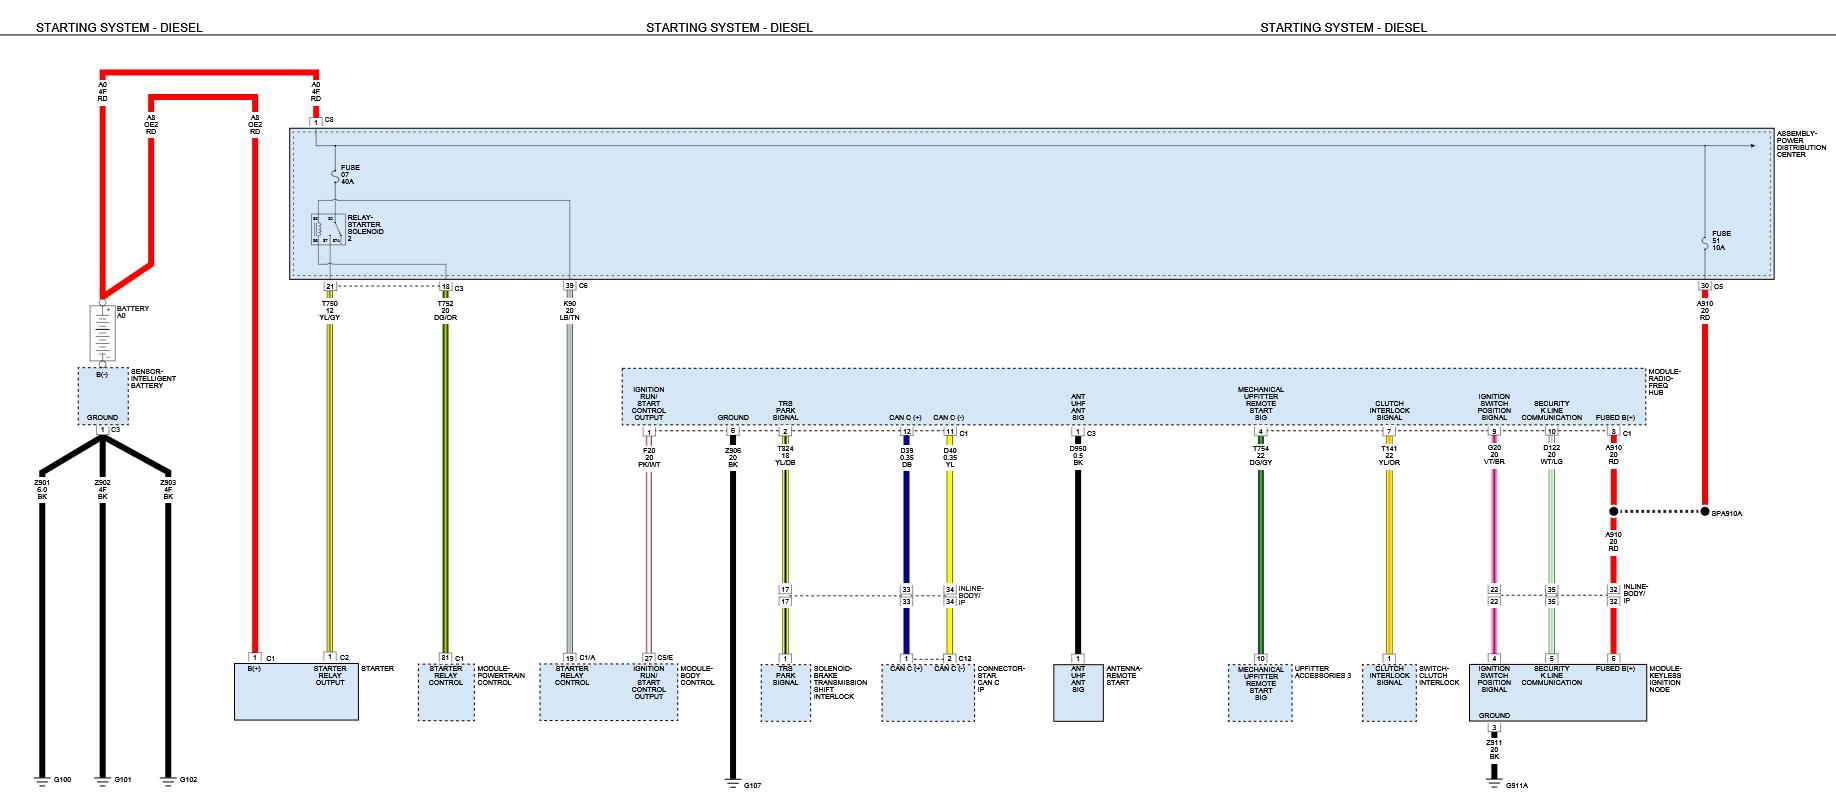 adf8e382-4354-45a4-96be-76d40b49167f_2014 D2 RAM starting.png